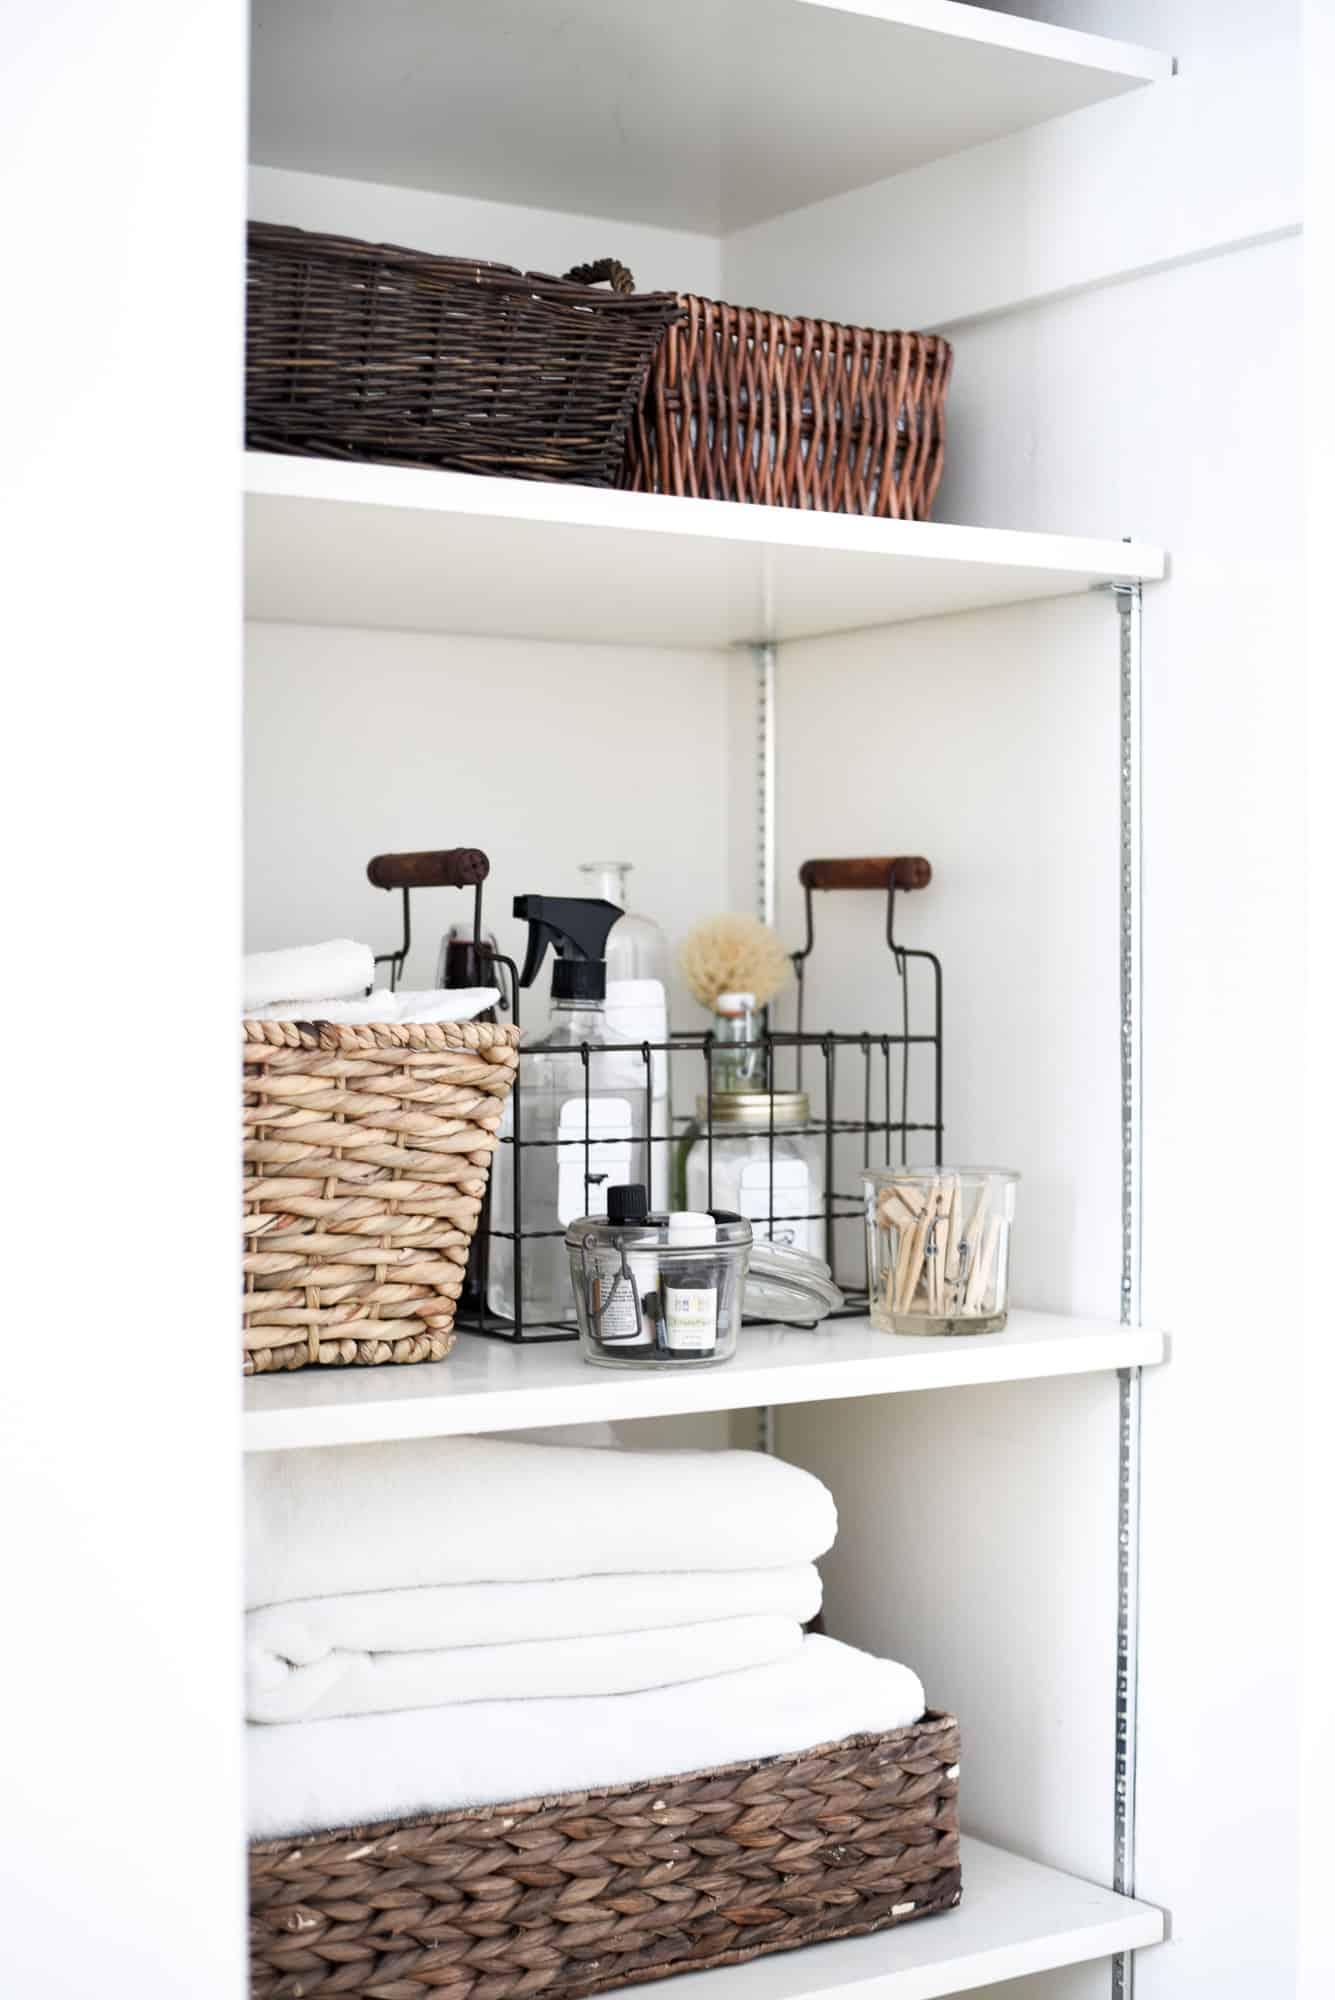 use baskets for closet organization